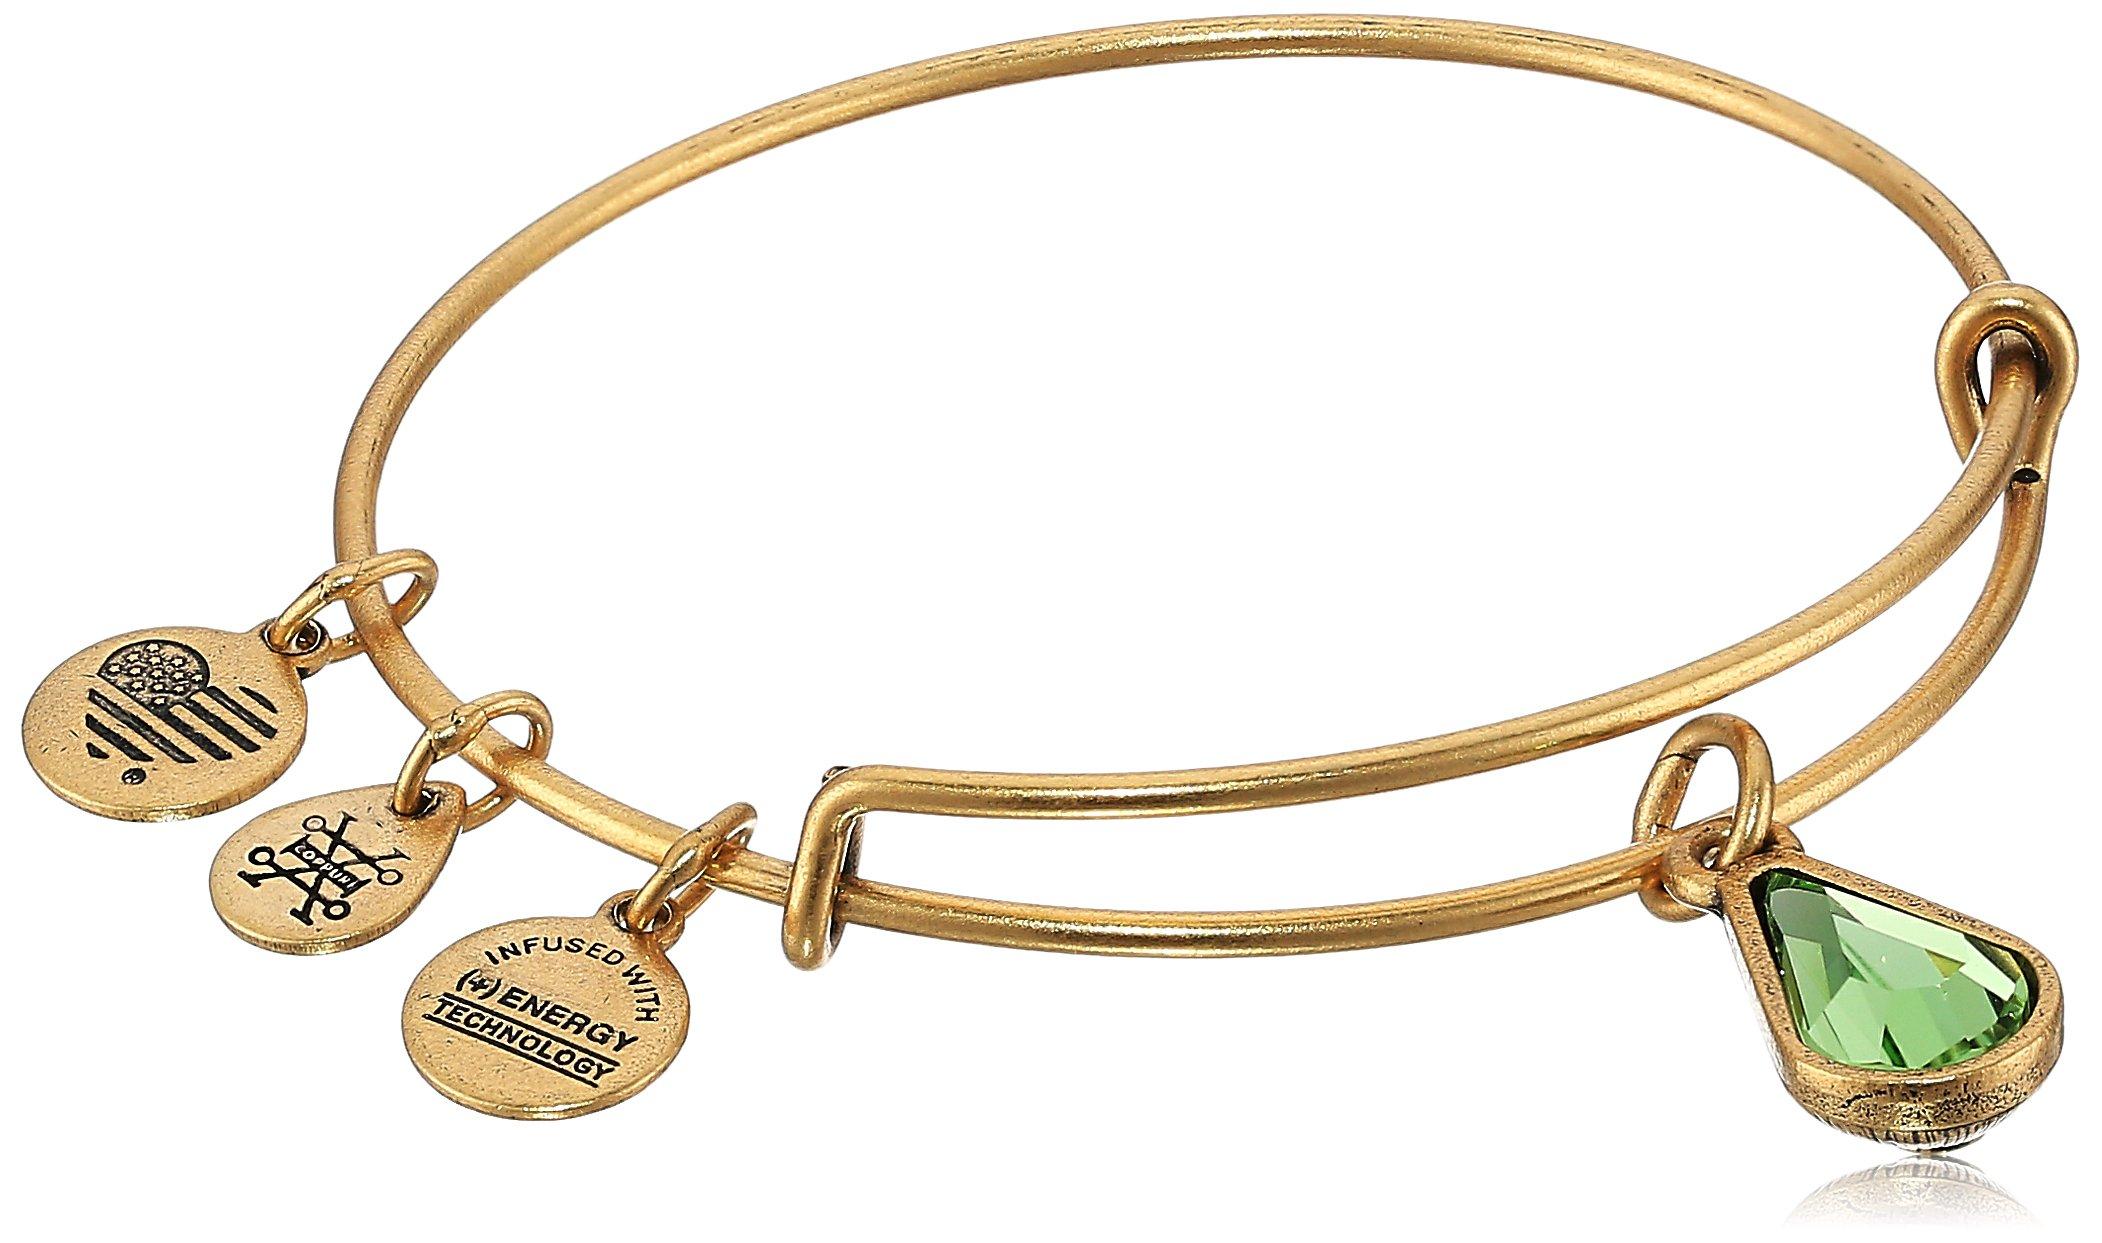 Alex and Ani August Birth Month Charm with Swarovski Crystal Rafaelian Gold Bangle Bracelet